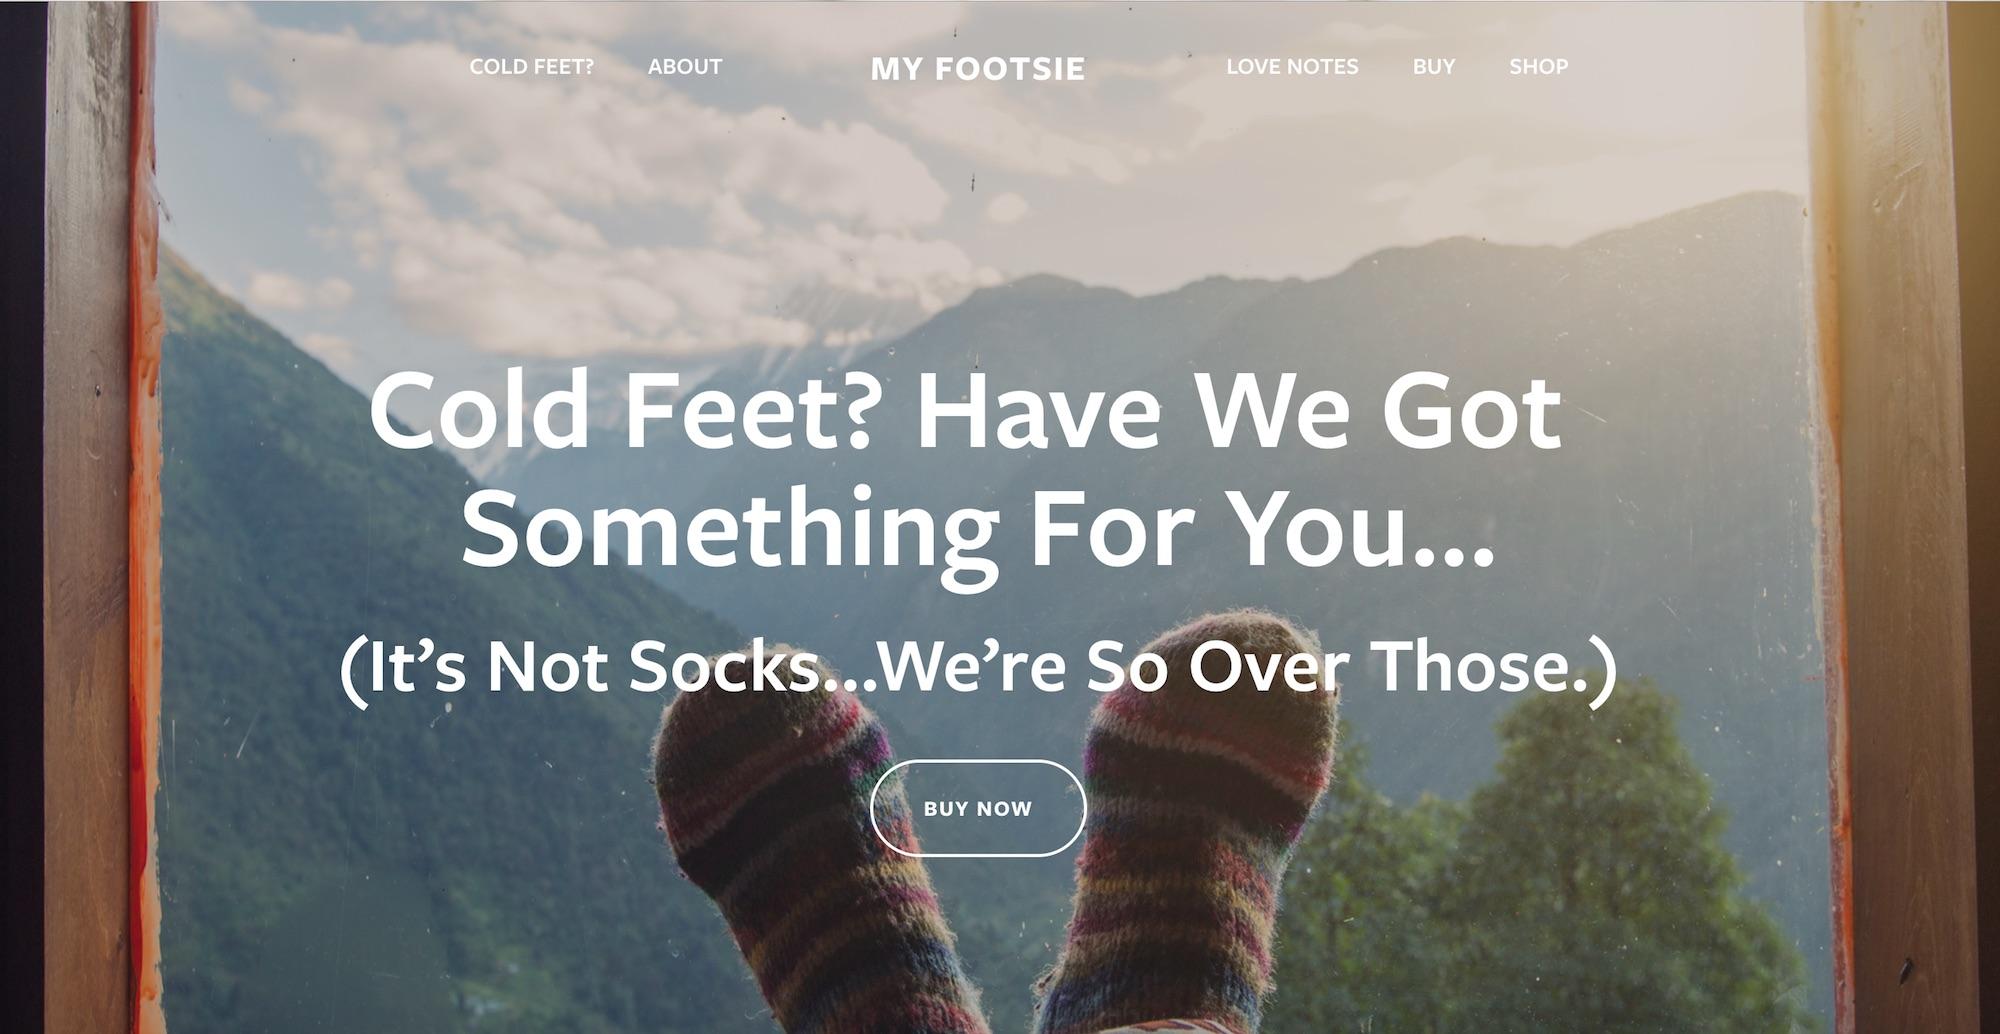 MyFootsie Foot Warmers , Manchester, Maine  (Visit Site)